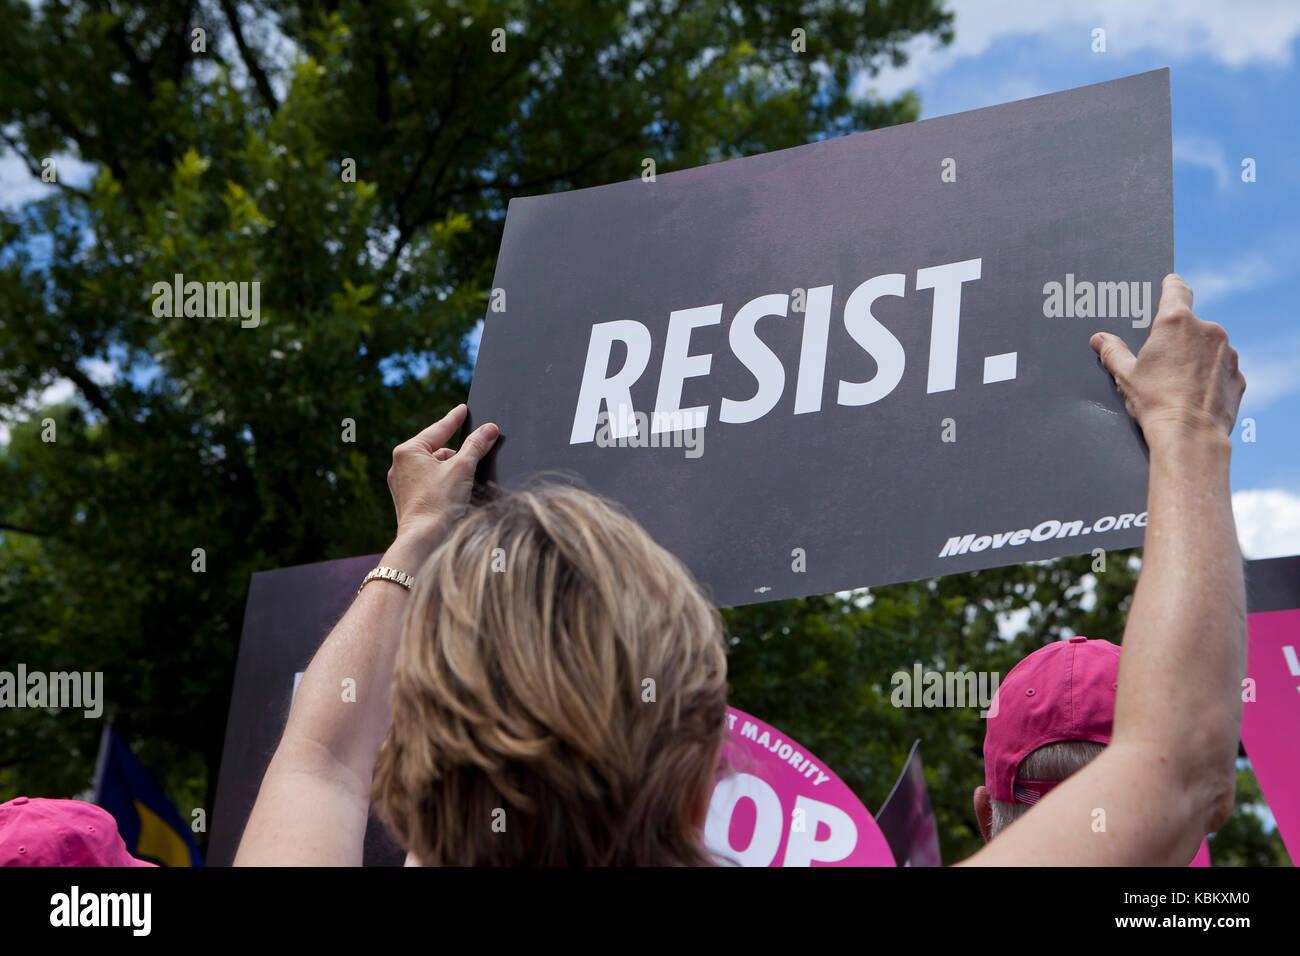 Woman holding RESIST sign at a progressive healthcare protest rally - Washington, DC USA - Stock Image